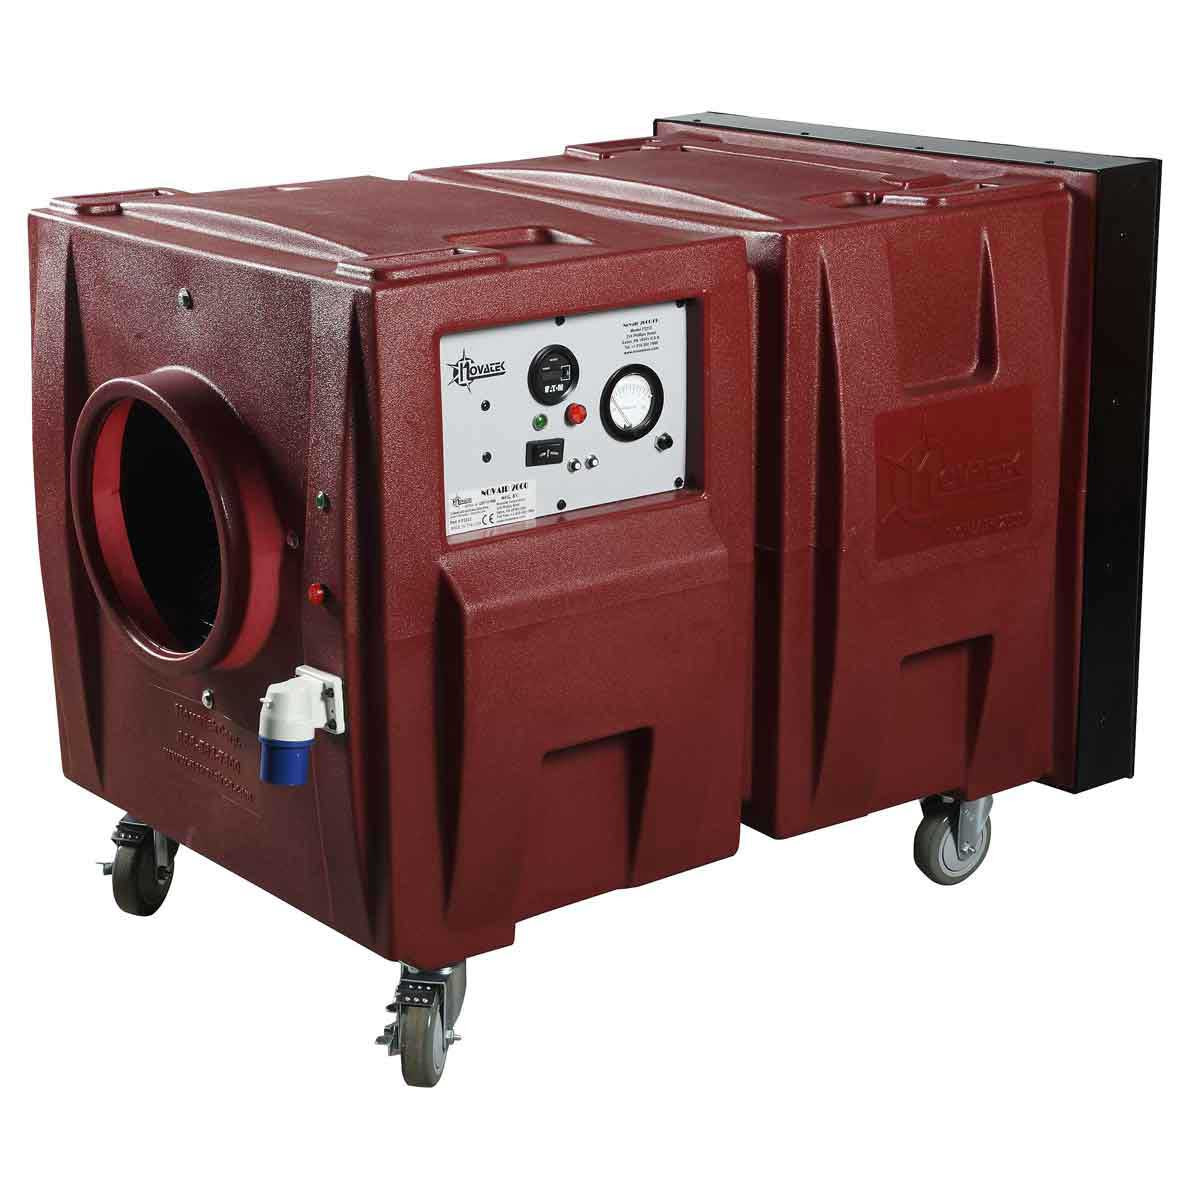 Novair 2000 BIO Air Filtration System 2